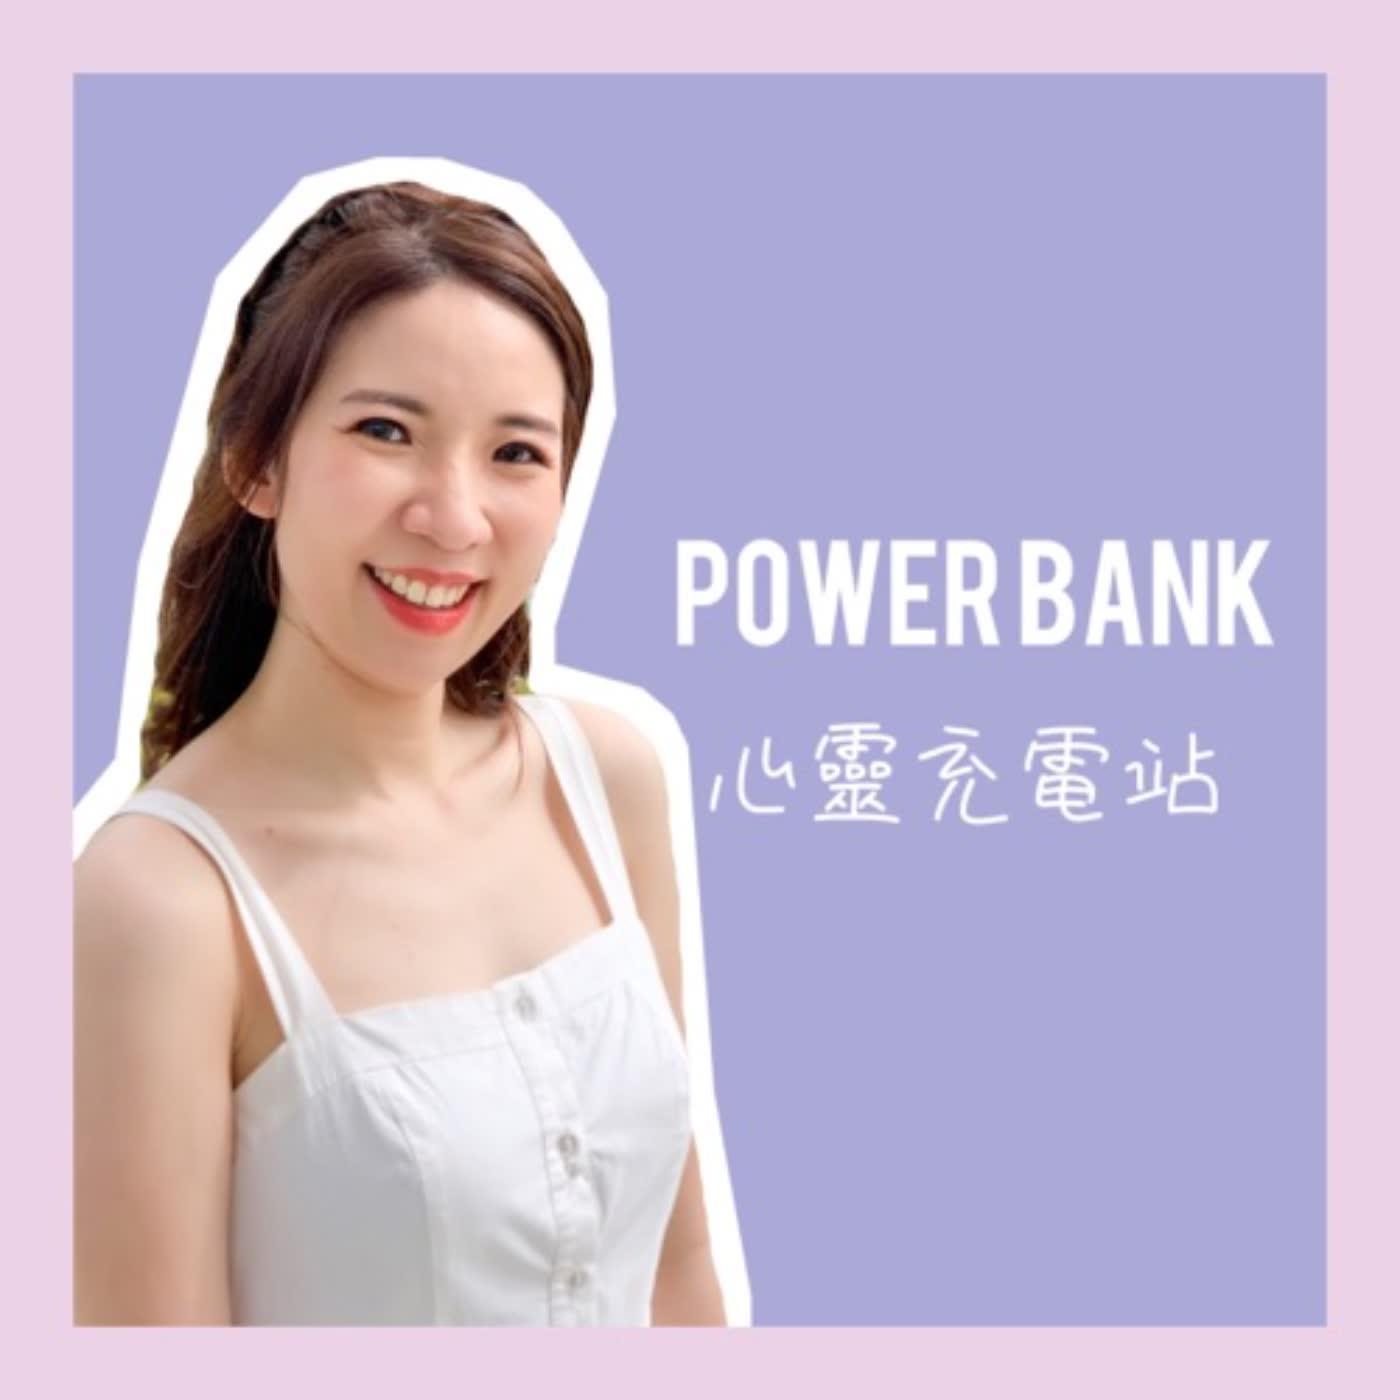 Power Bank 心靈充電站